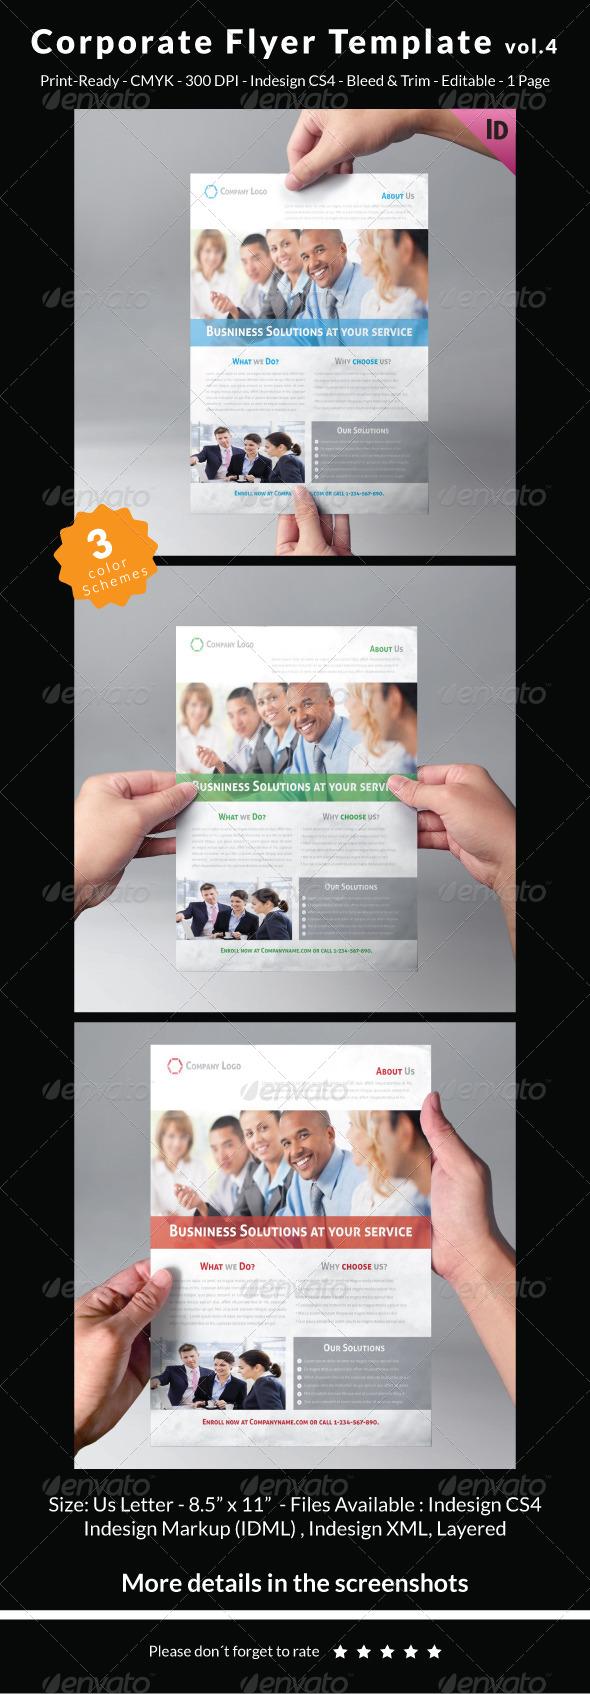 GraphicRiver Corporate Flyer Template Vol.4 7165609